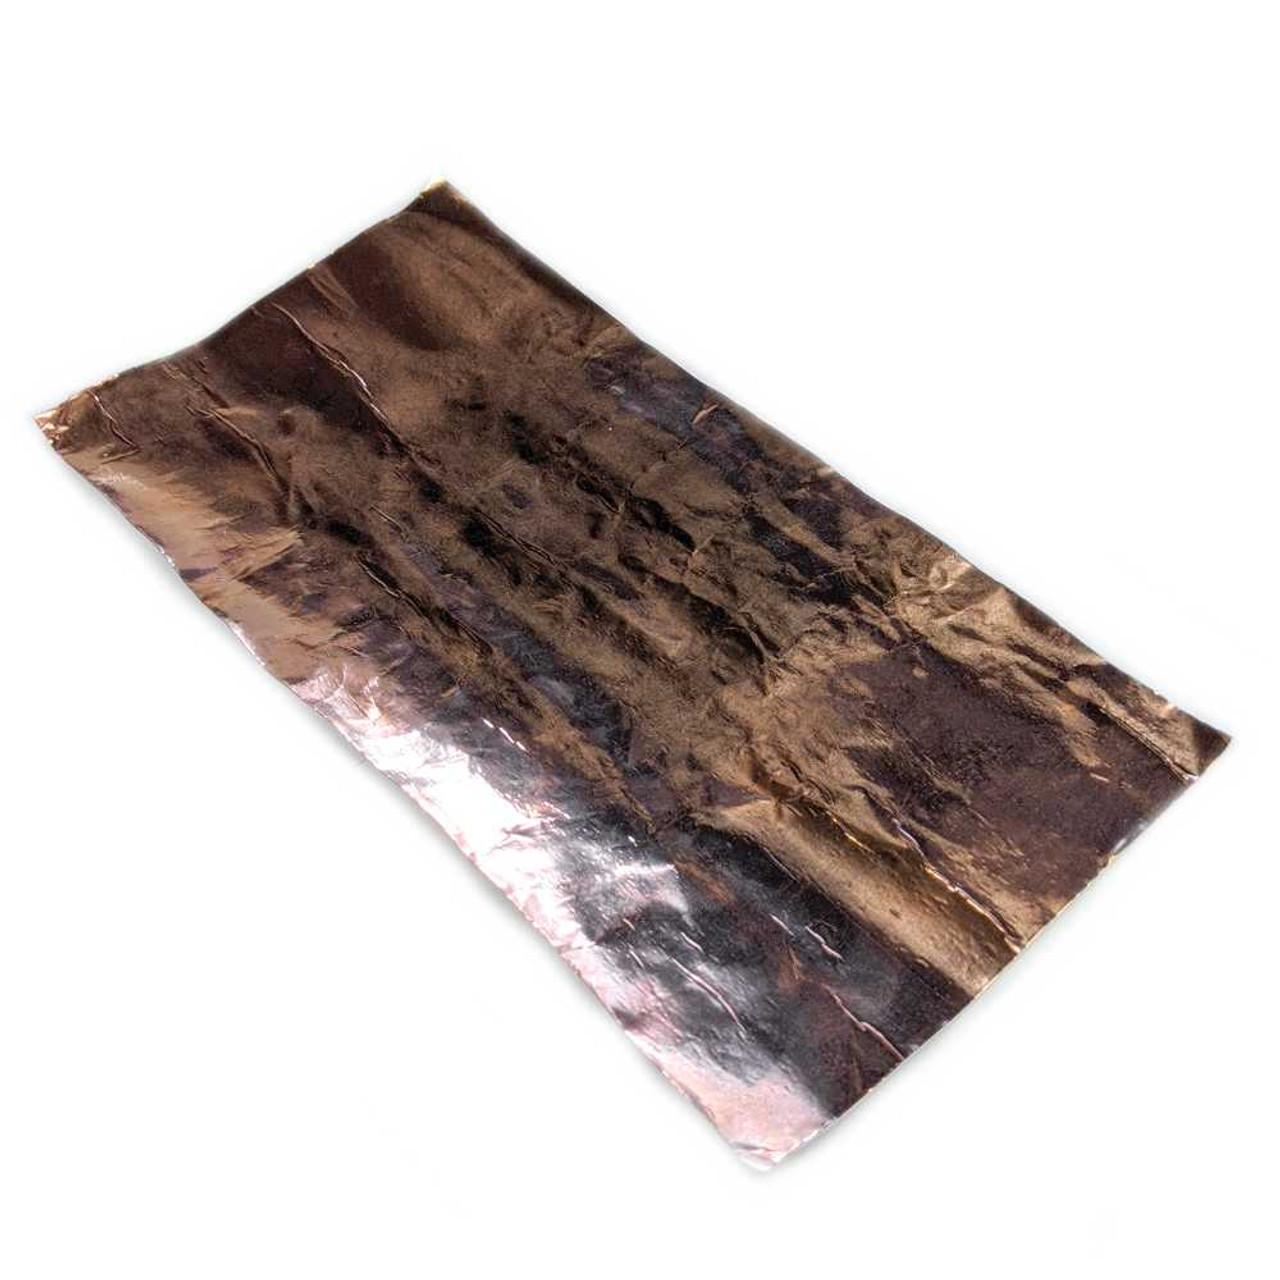 "Copper Shielding Tape - 5"" x 12"" Strip"